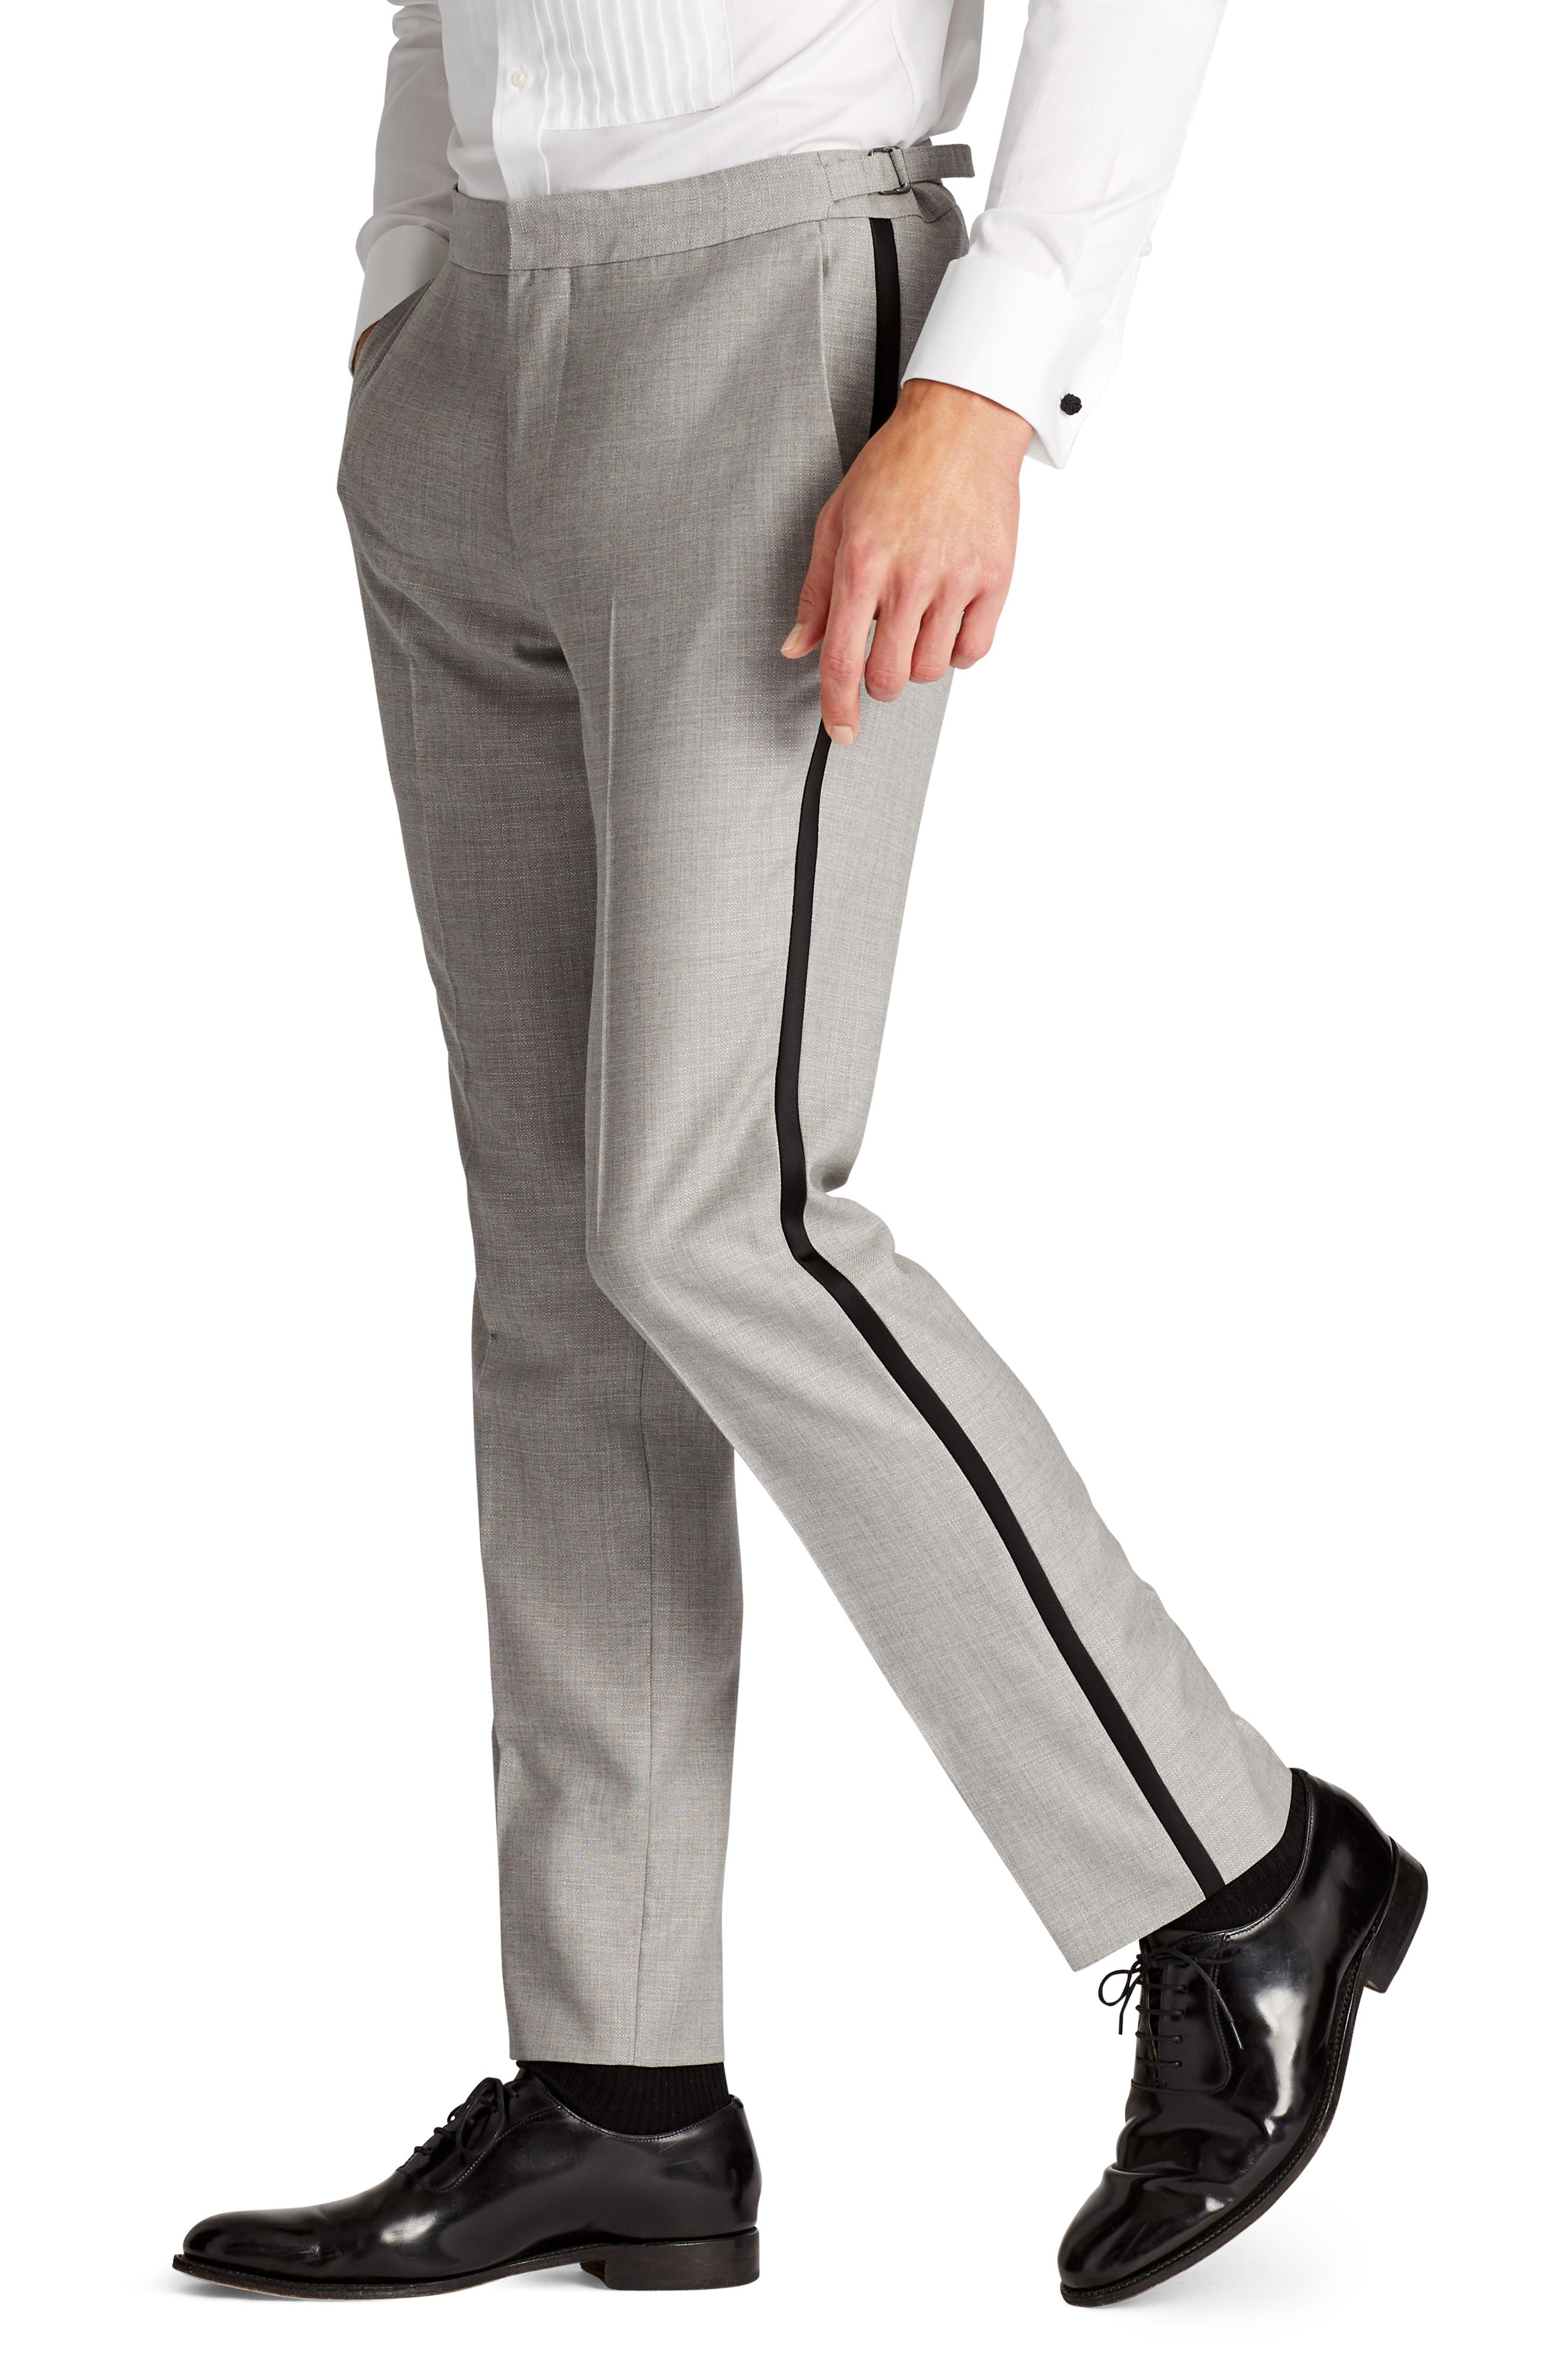 Capstone Flat Front Tuxedo Trousers,                             Alternate thumbnail 3, color,                             020